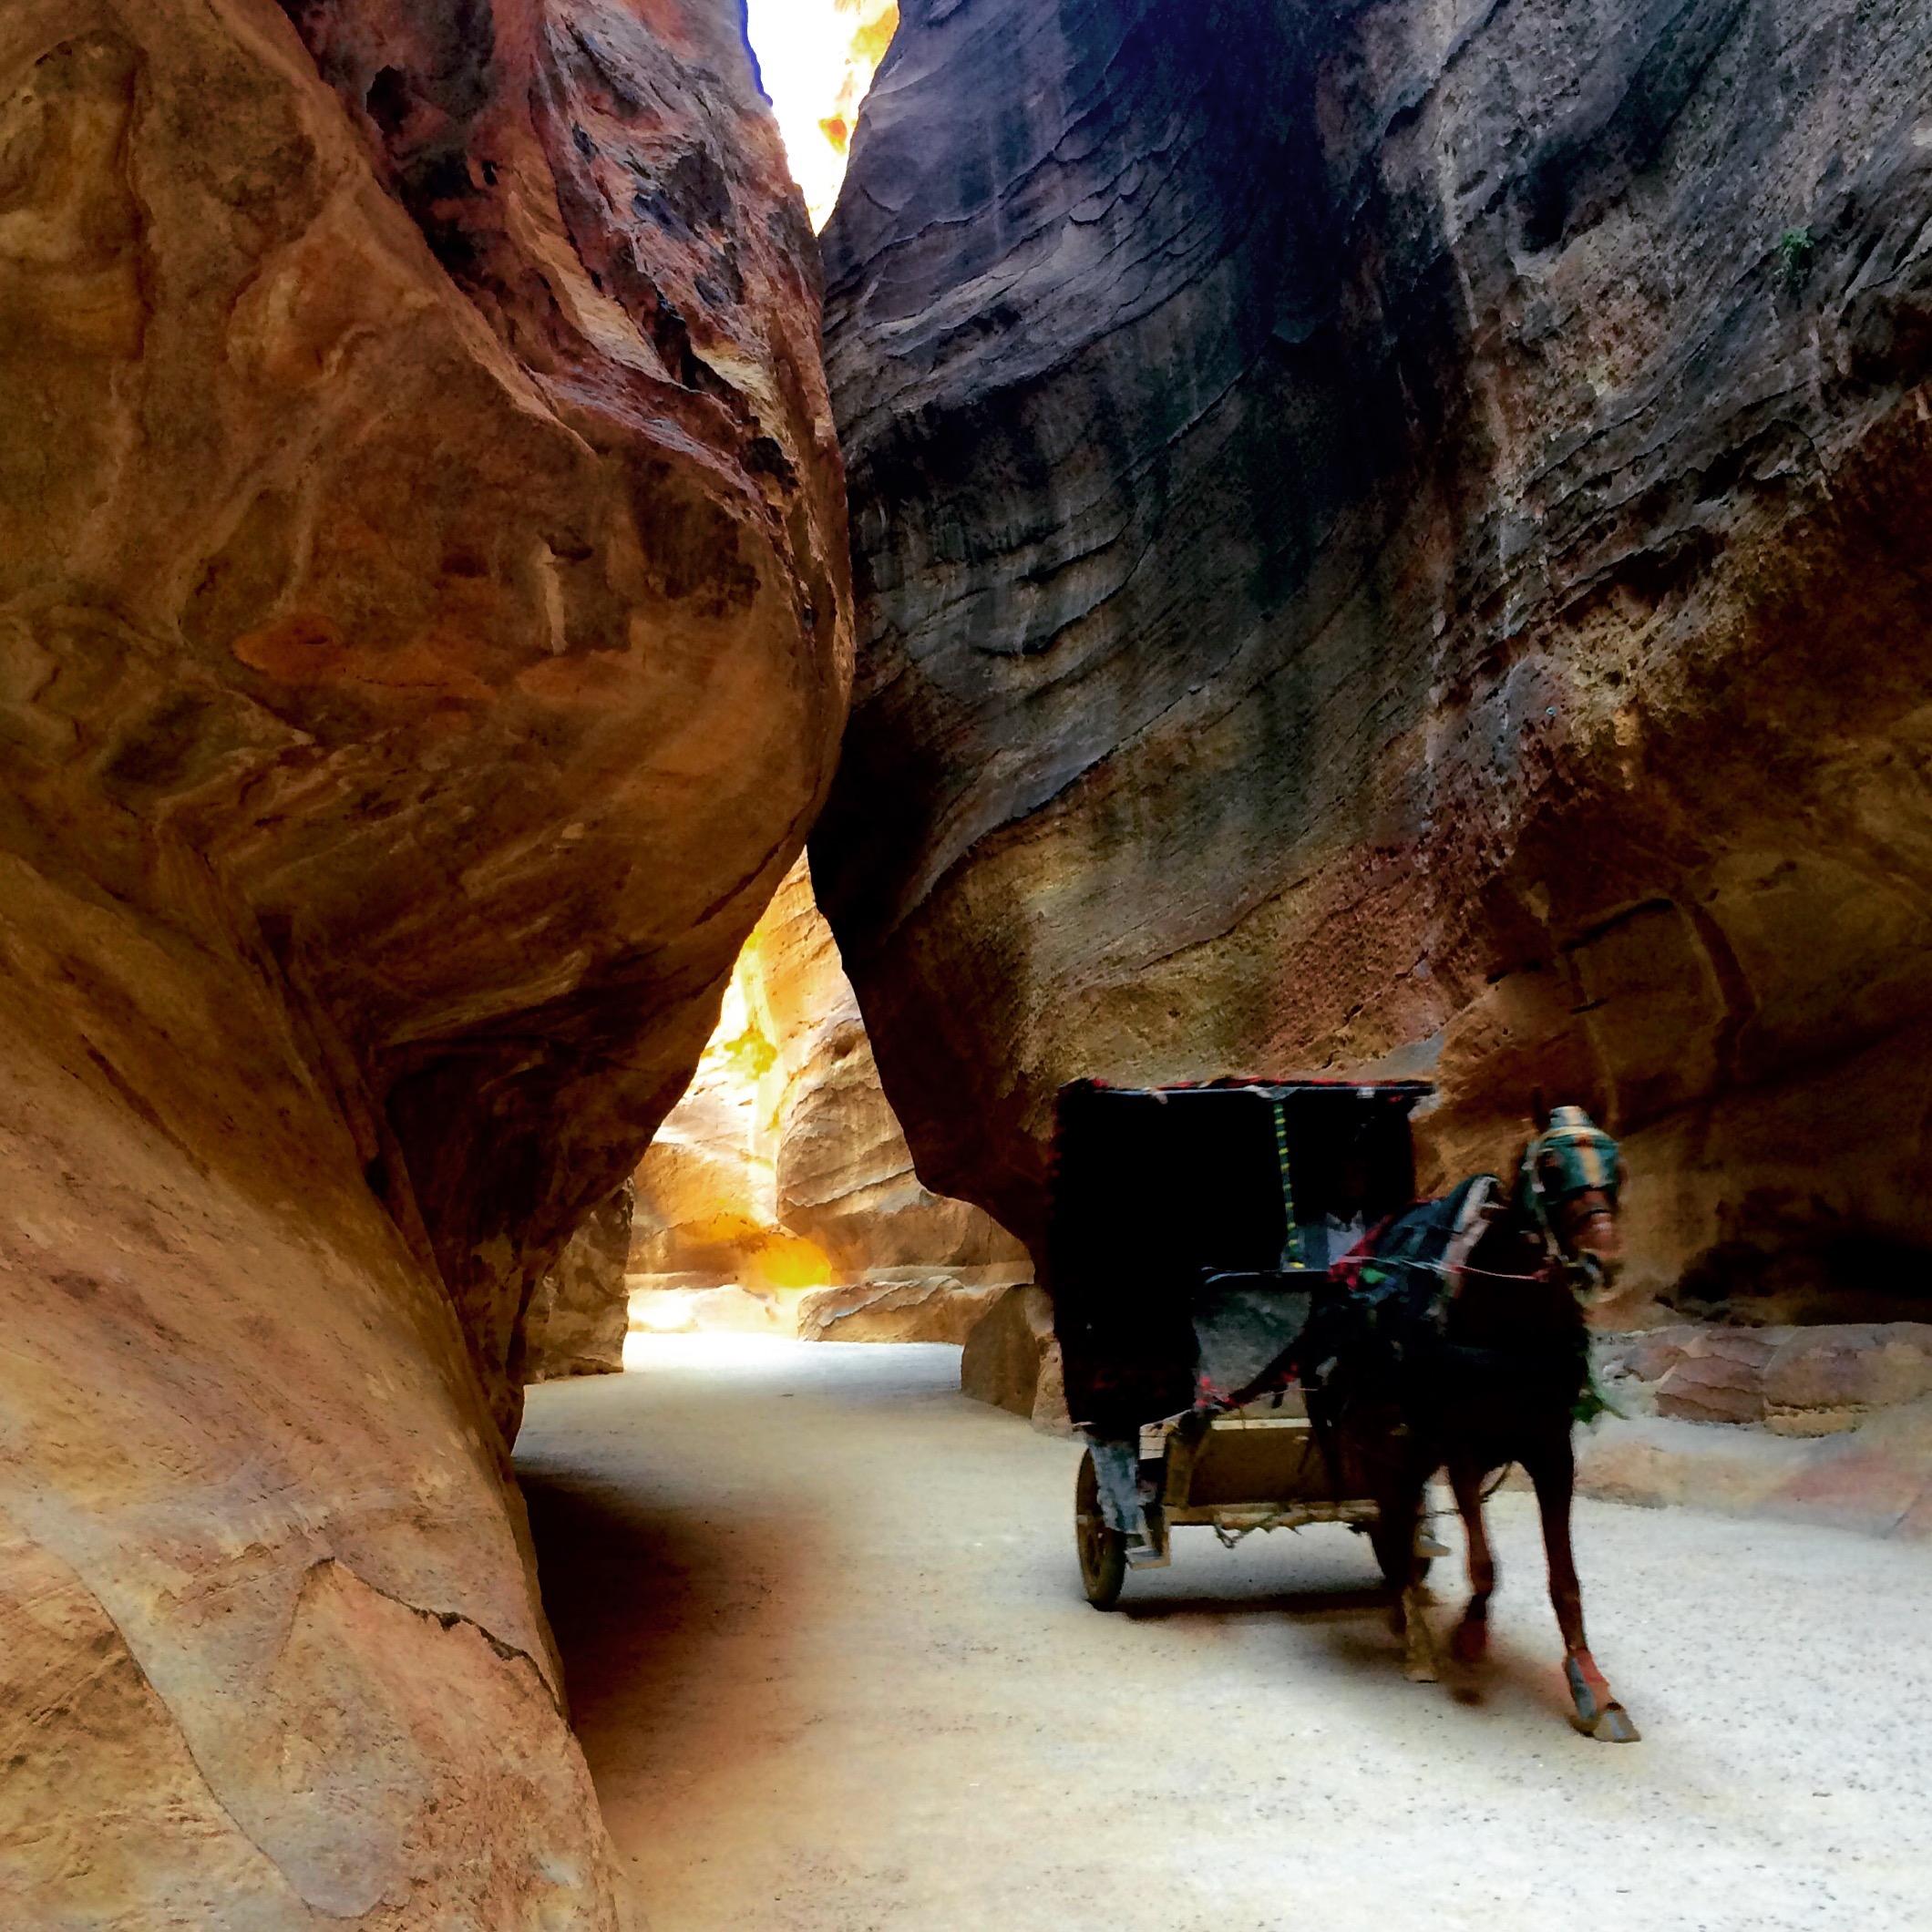 Horse carriage in the Siq, Petra Jordan - 3 Days*